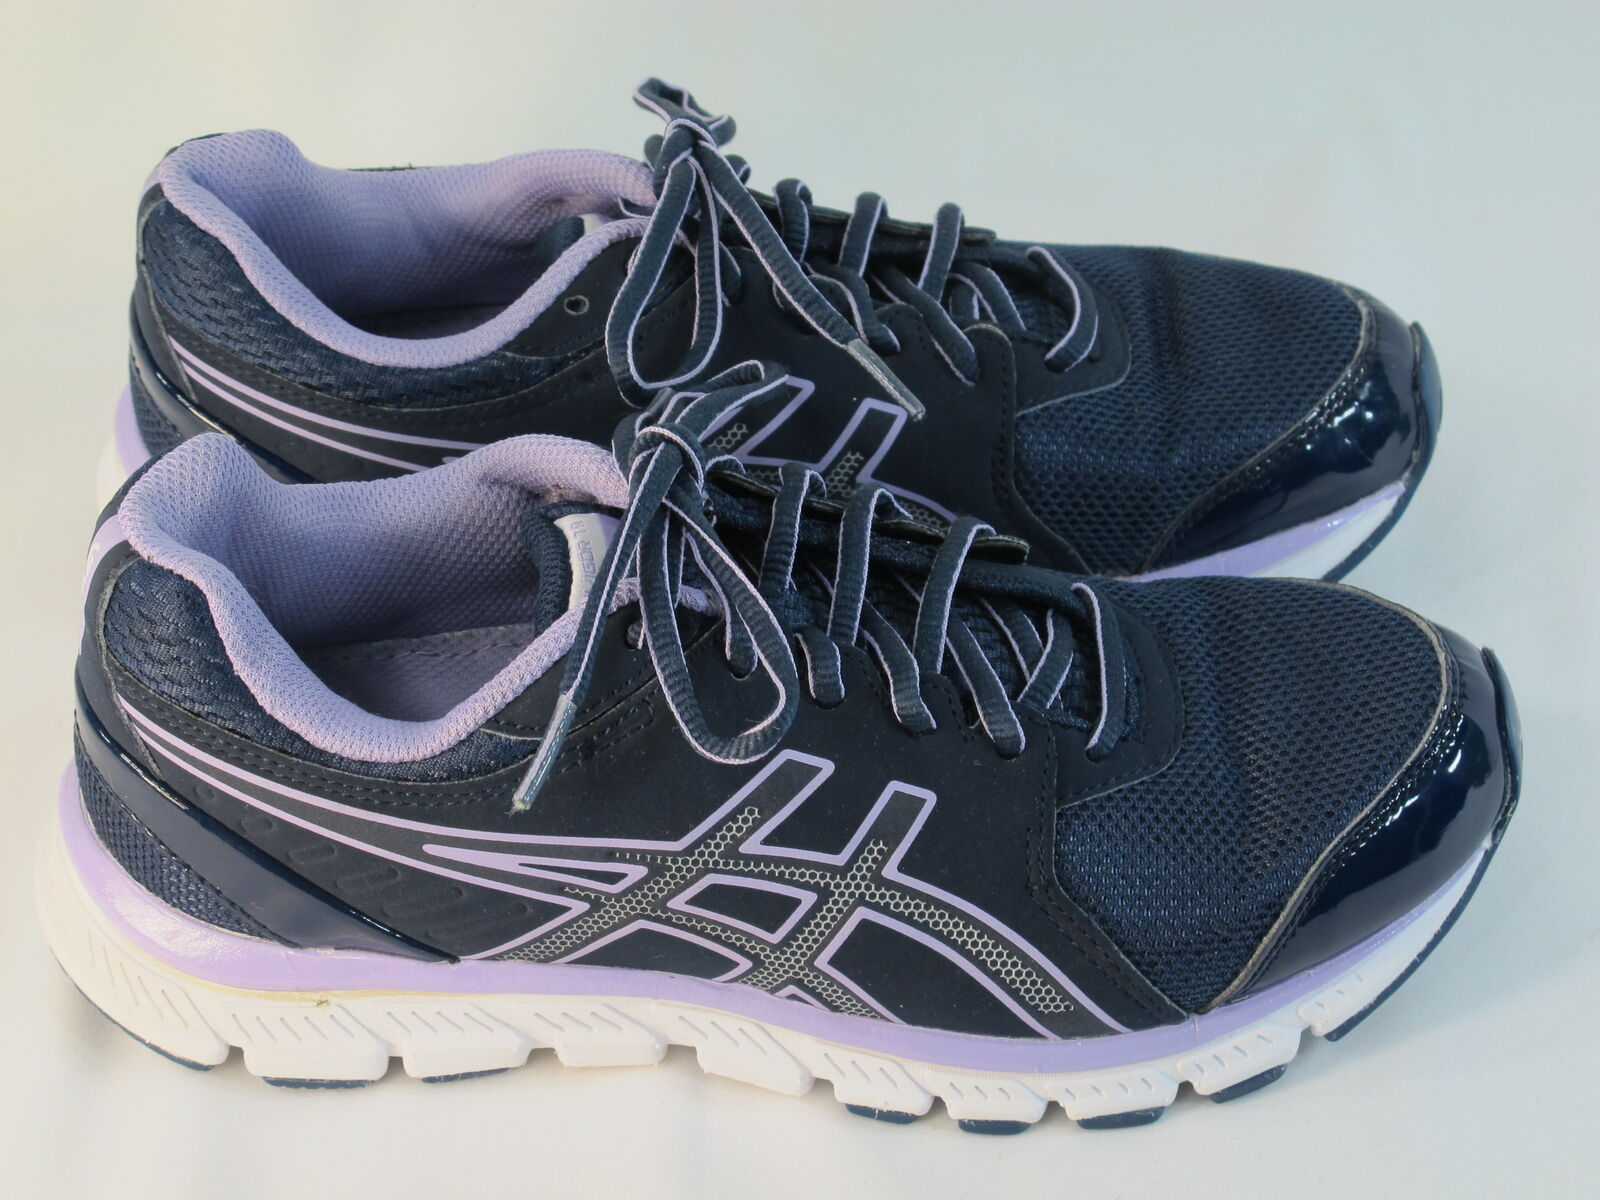 ASICS Gel Envigor TR Cross Training shoes Women's Size 8 US Near Mint Condition